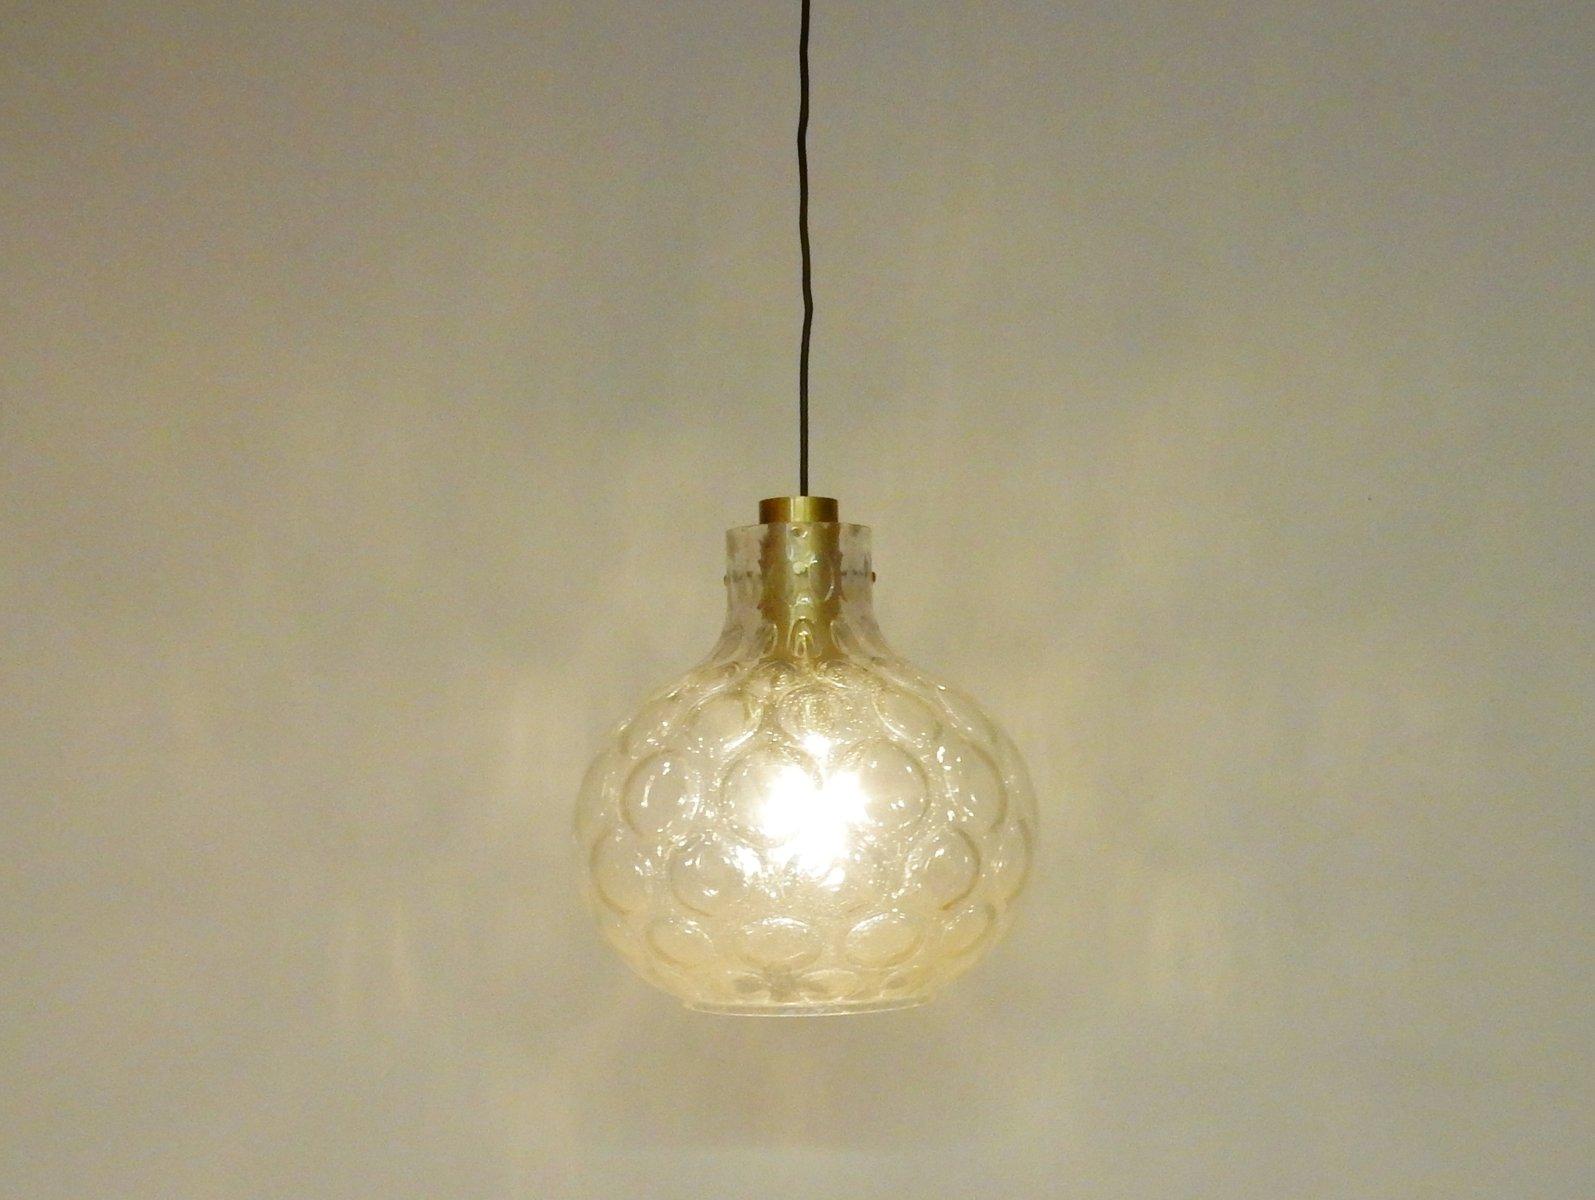 Vintage thick glass pendant light by glashtte limburg 1960s for vintage thick glass pendant light by glashtte limburg 1960s mozeypictures Choice Image